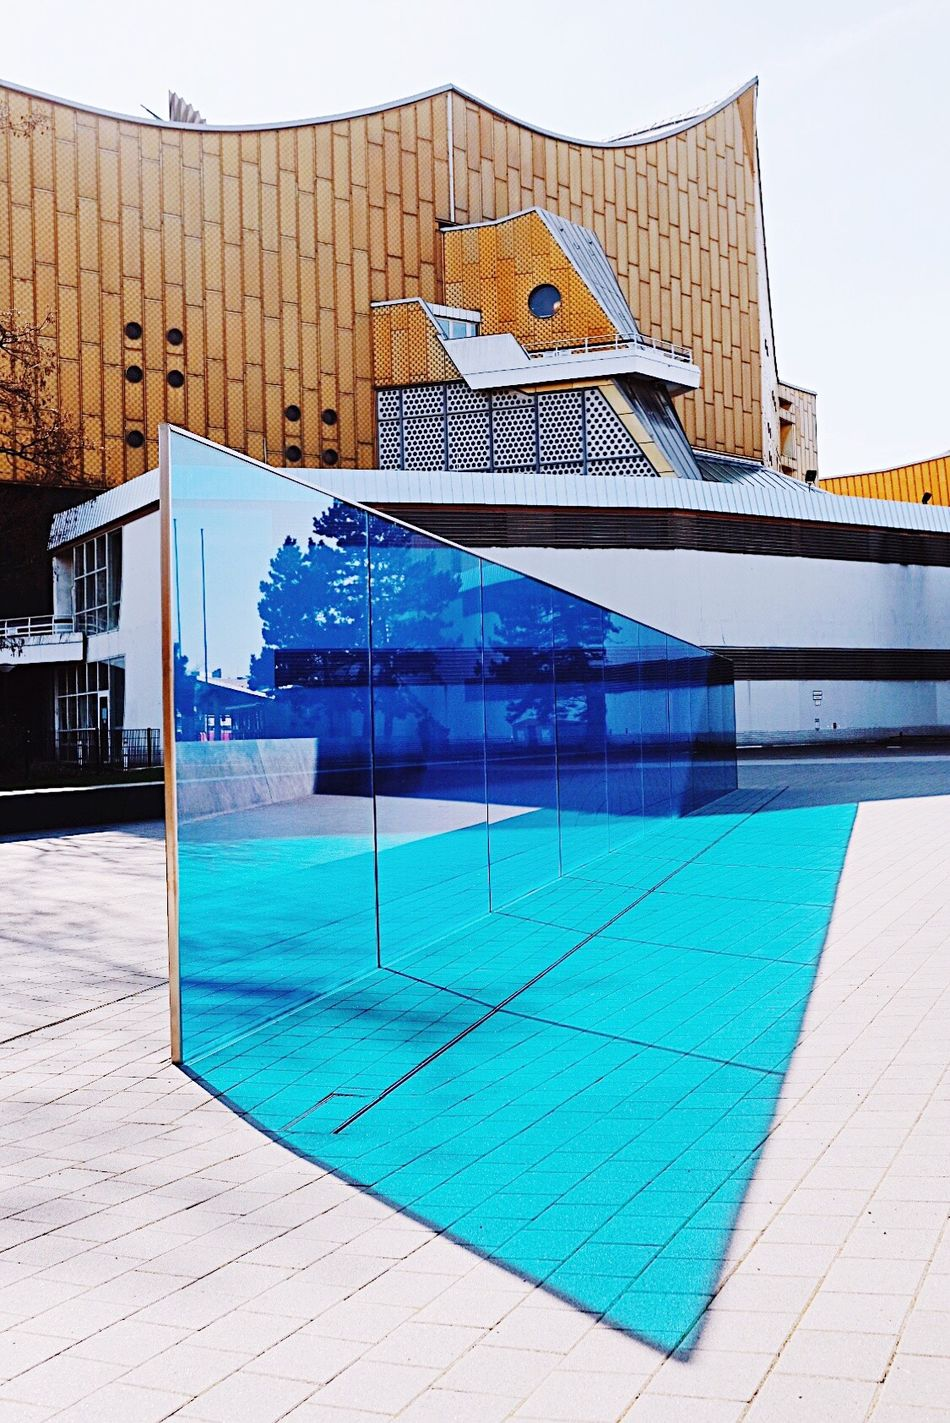 Berlin treasures 💠 Architecture Building Exterior Built Structure Sunlight City Modern Outdoors Day Art Sculpture Blue Glass Berlin Art Is Everywhere